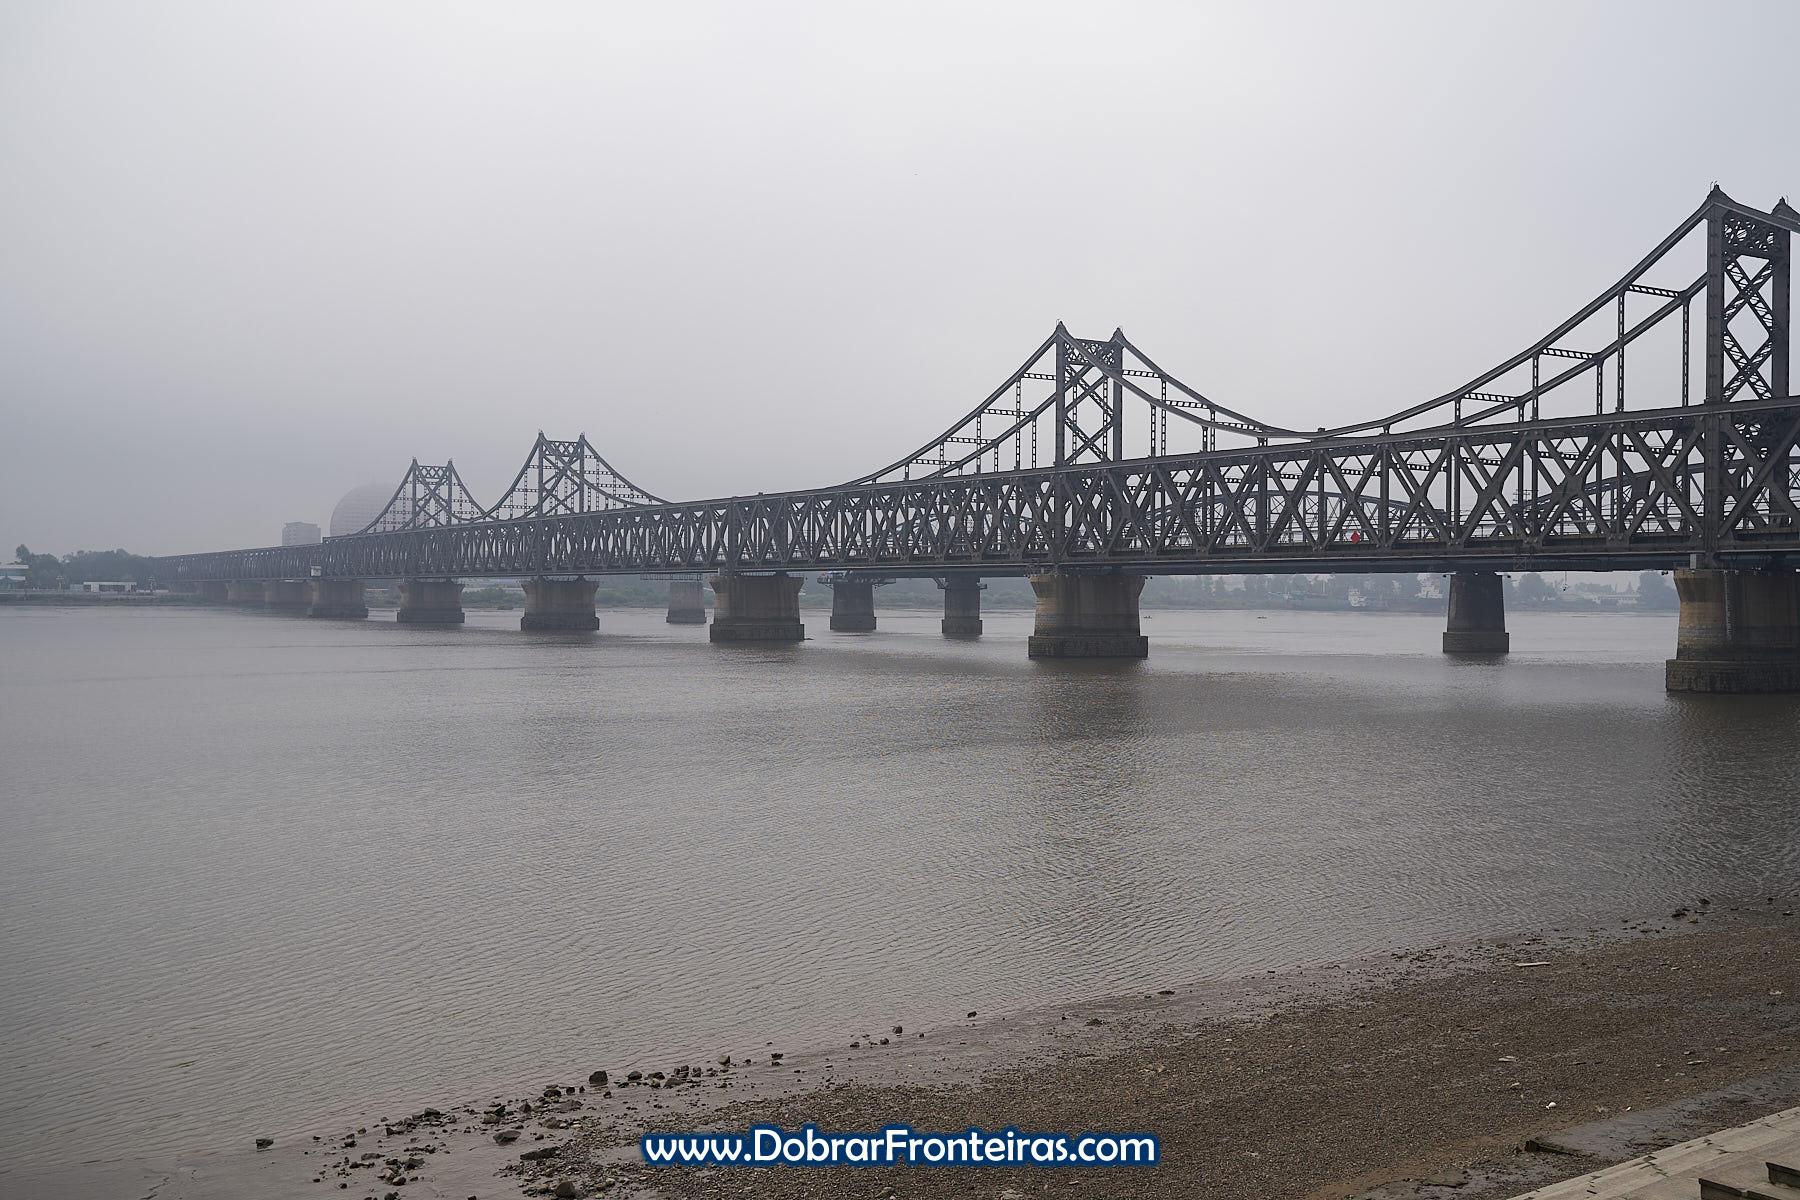 Ponte da Amizade Sino-Coreana sobre o rio Yalo, Dandong, China